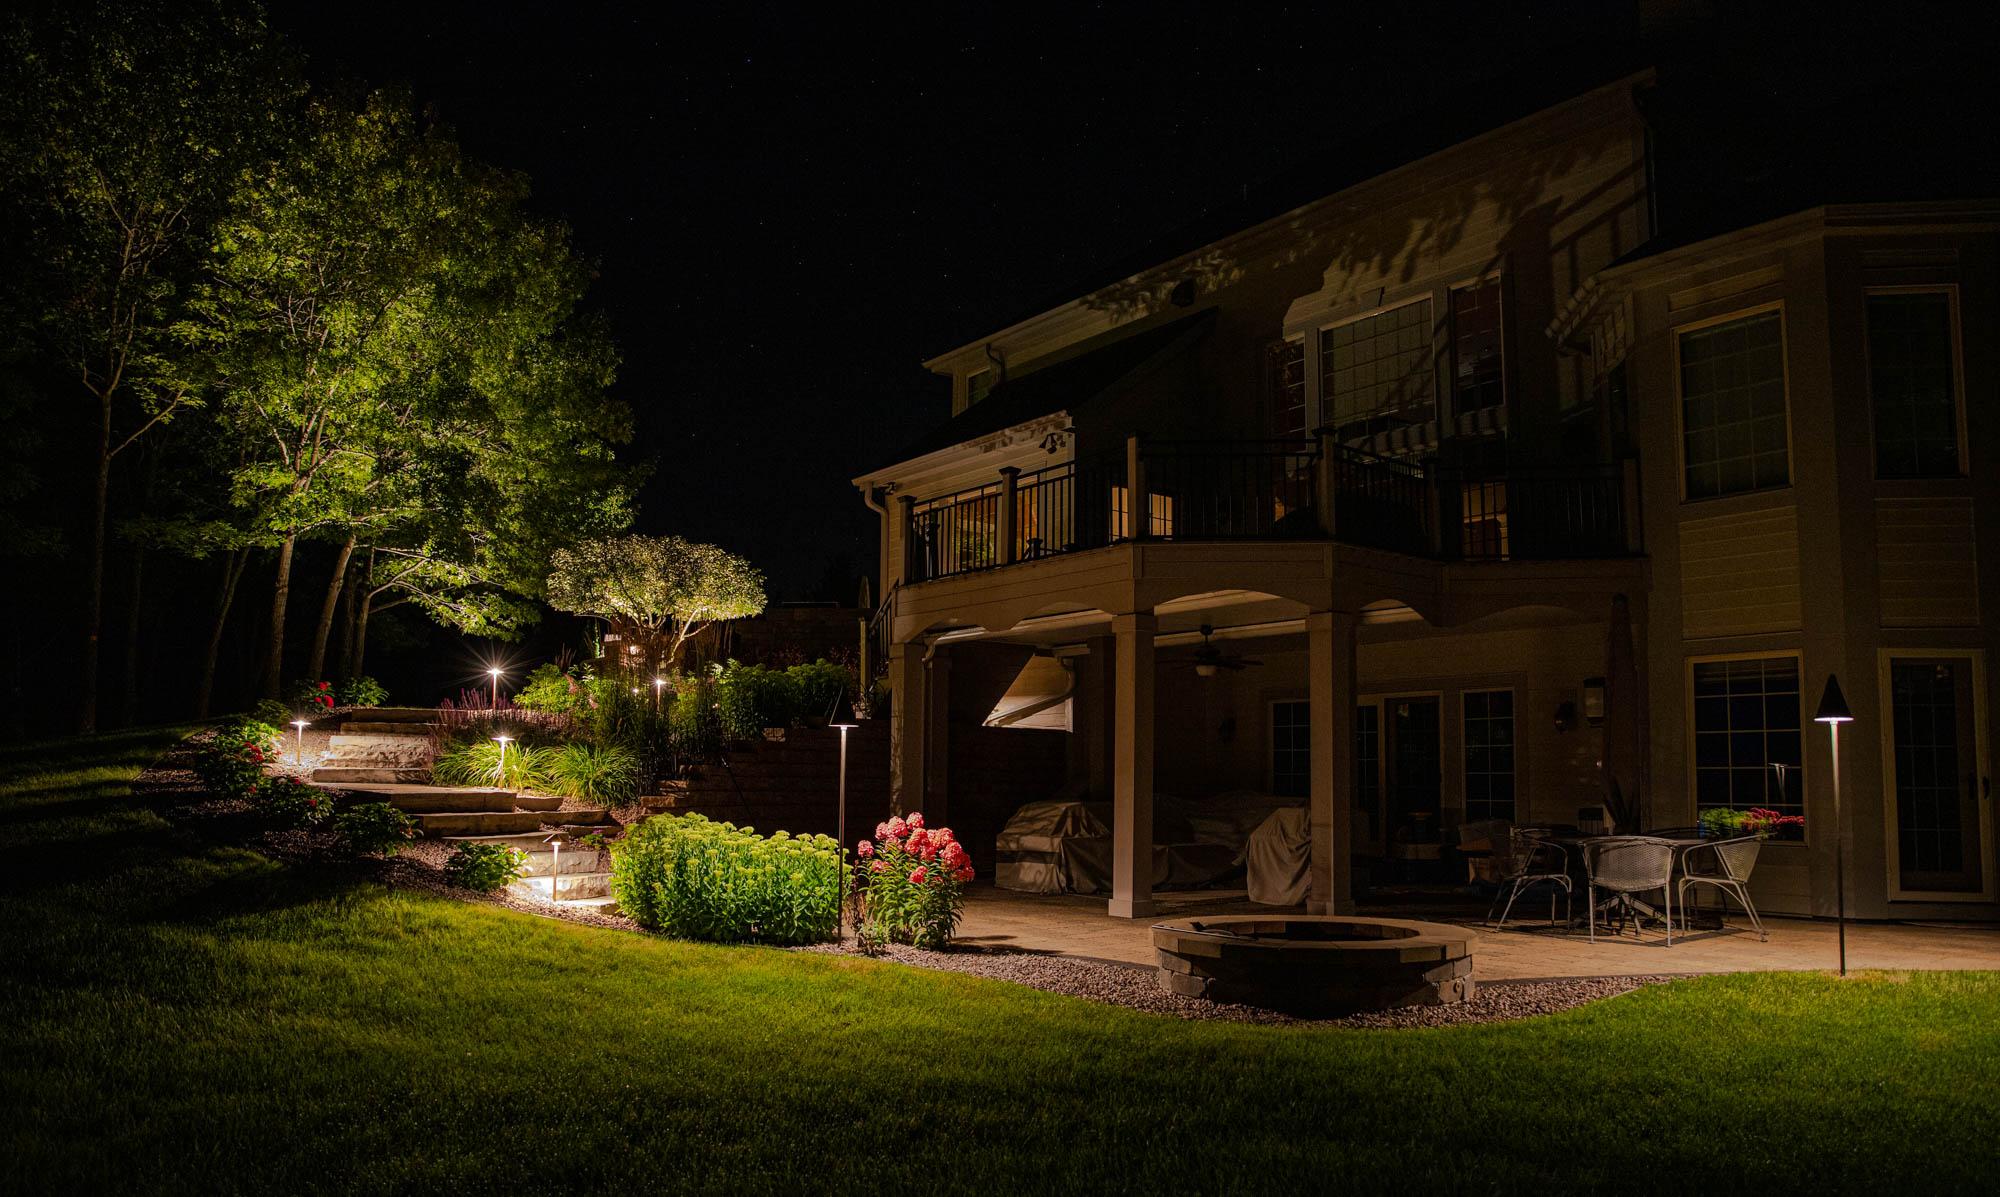 mukwonago landscape outdoor lighting night owl desk fire pit tree uplighting path lights